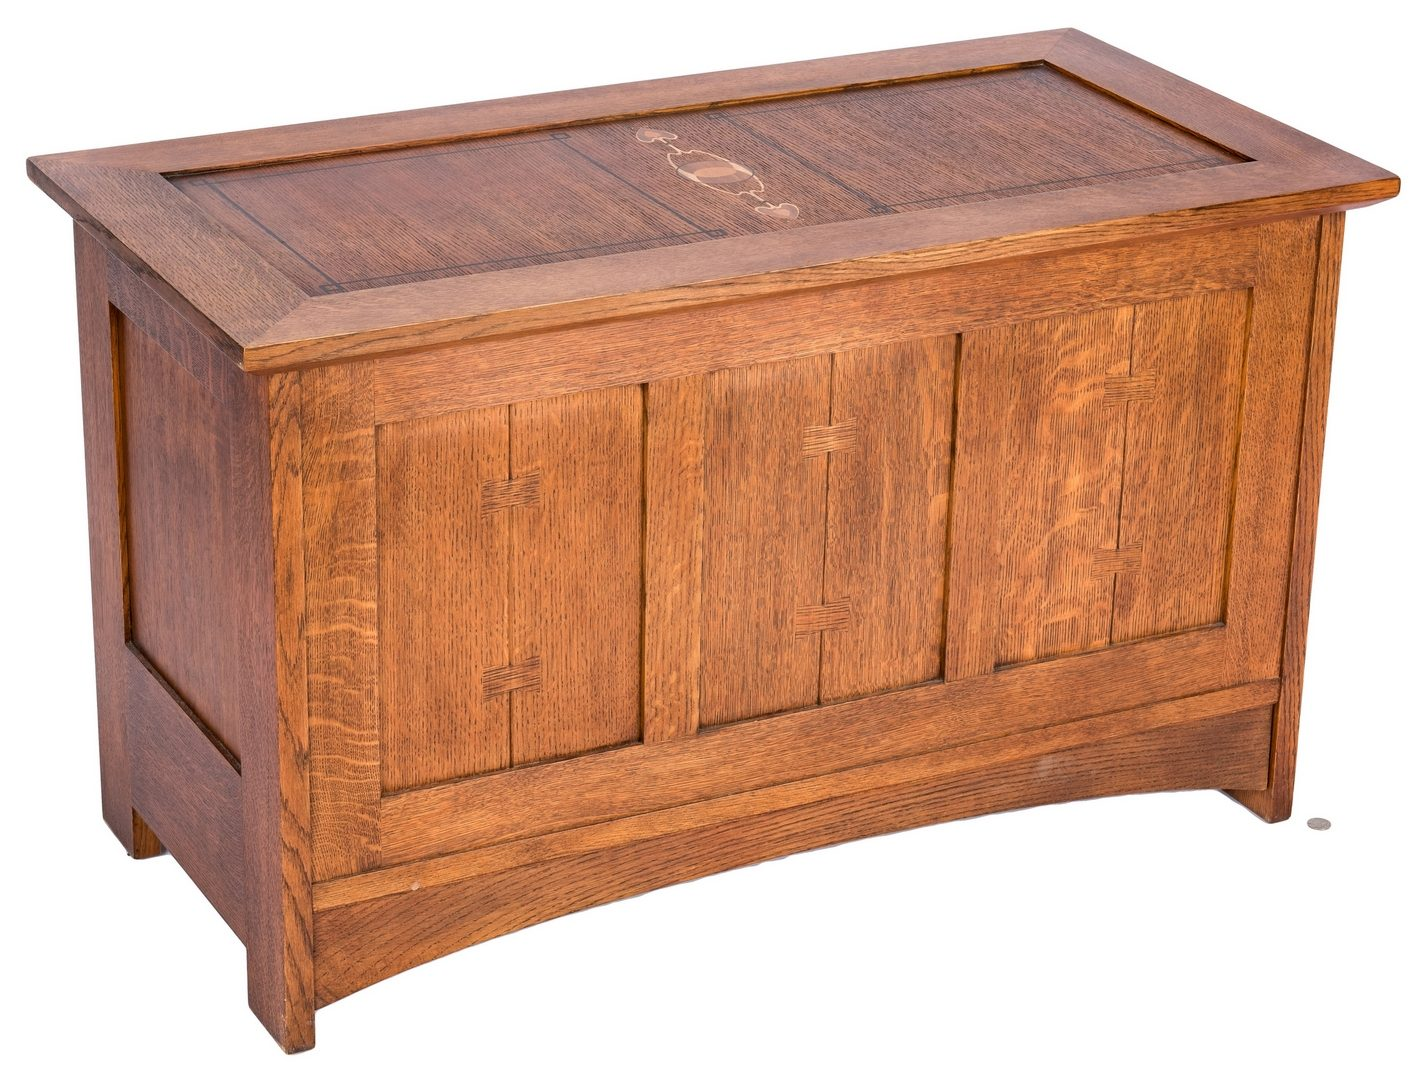 Lot 117: Stickley Inlaid Oak Inlaid Chest